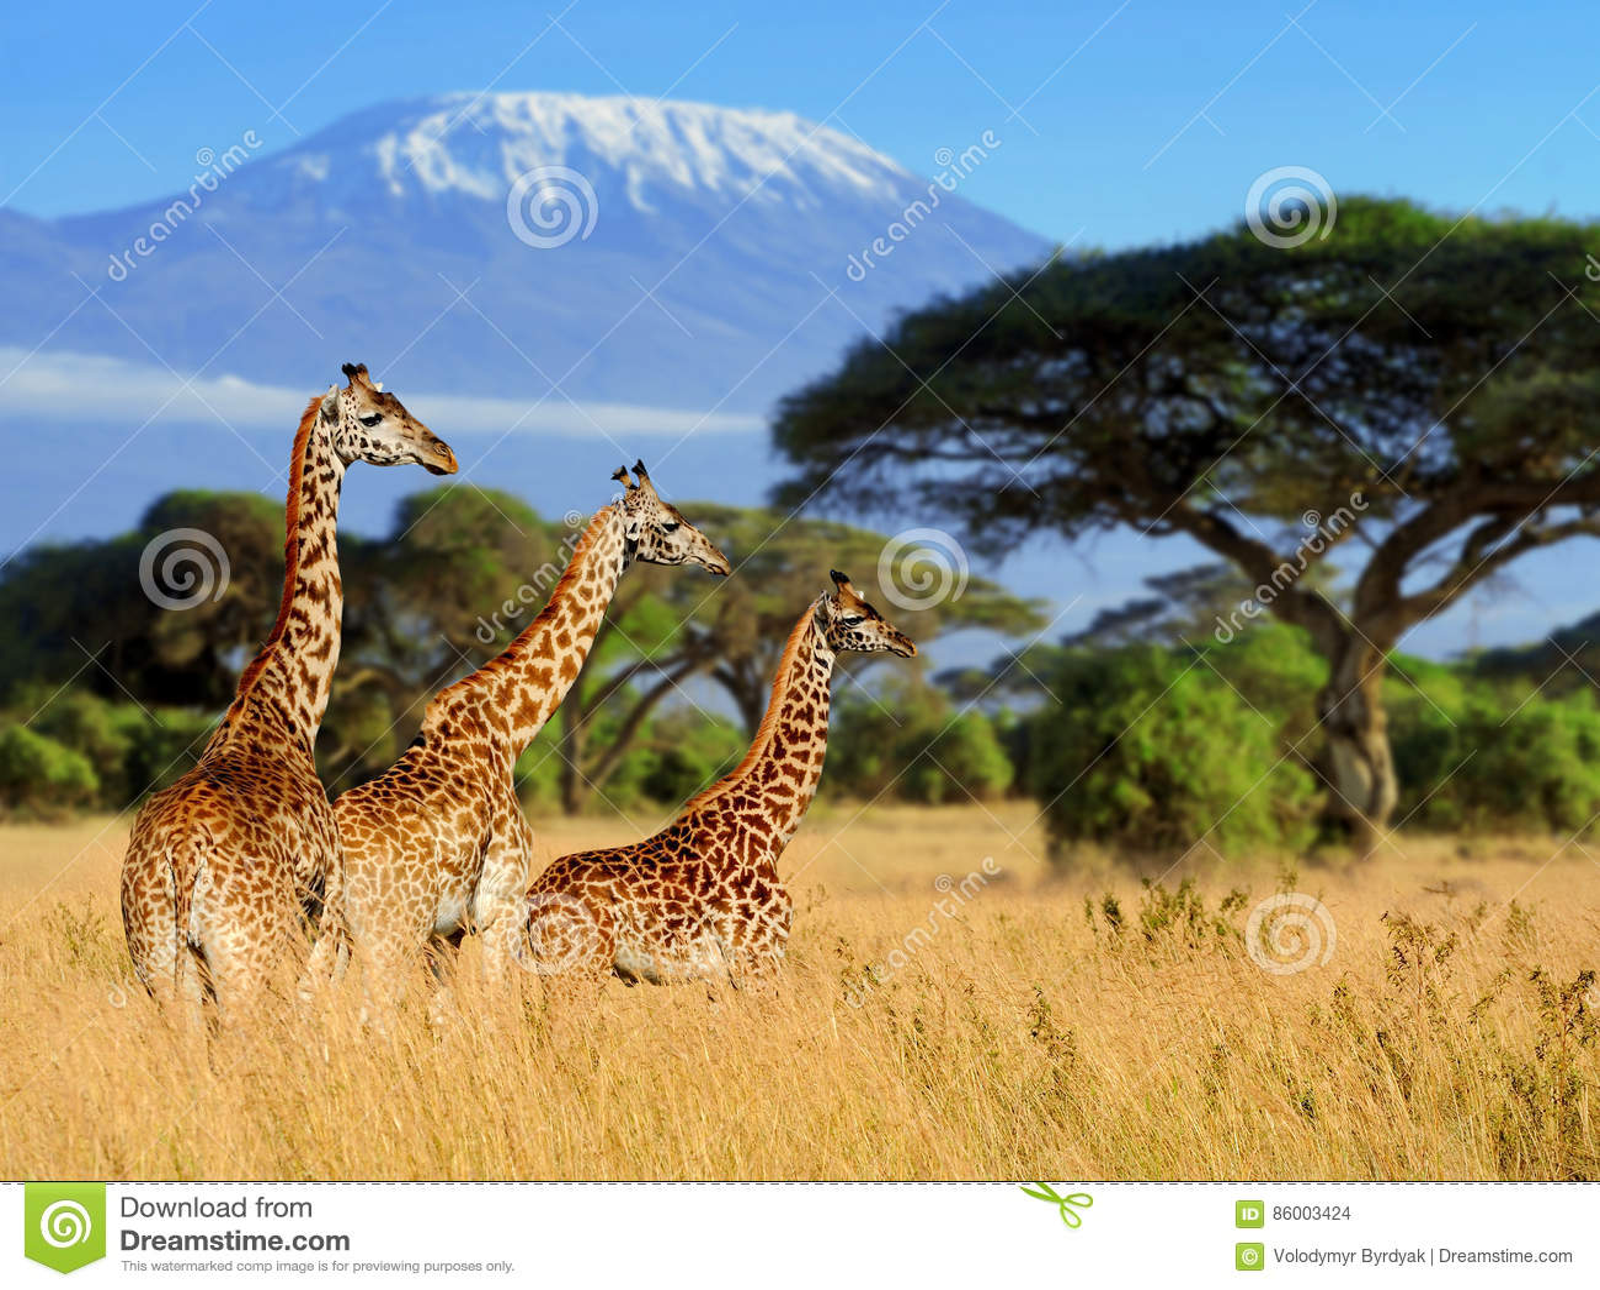 Giraf drie op Kilimanjaro zet achtergrond op